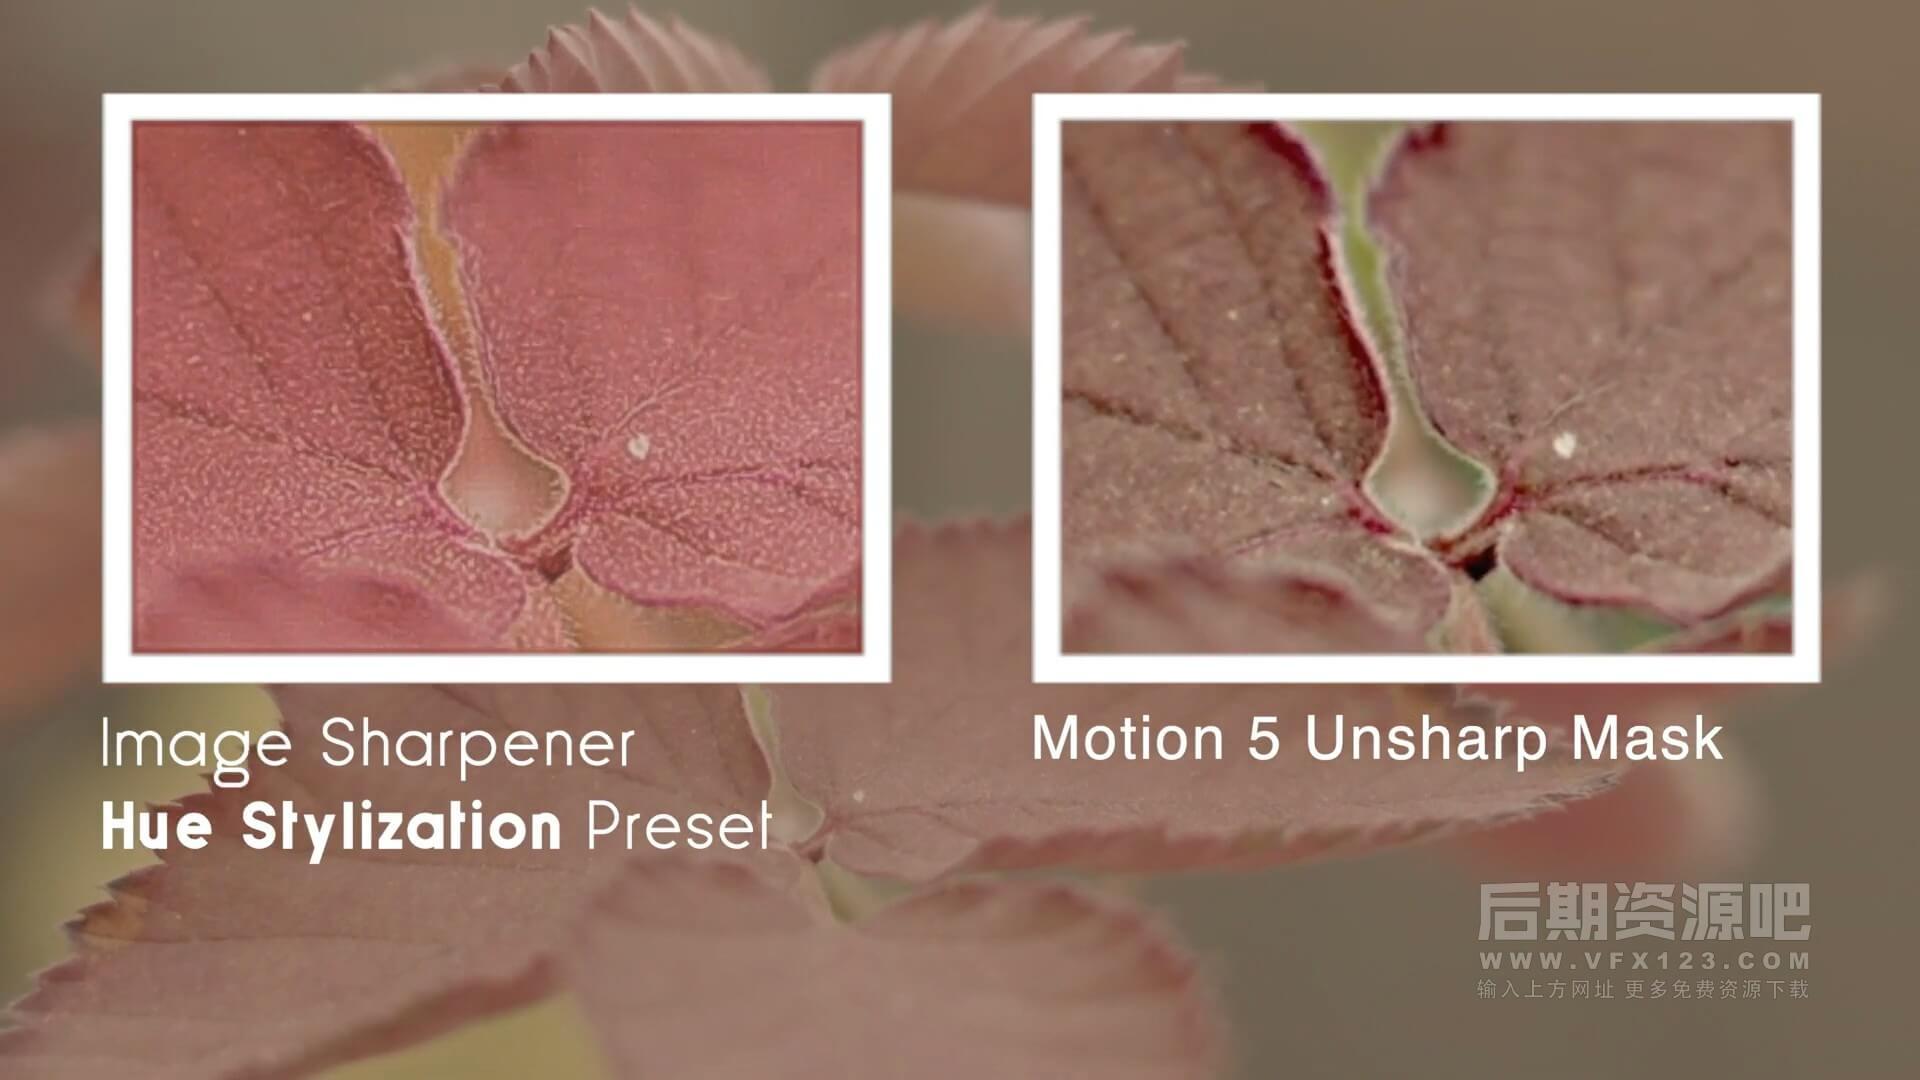 fcpx插件 视频图像锐化工具画面清晰度增强插件 Image Sharpener 2